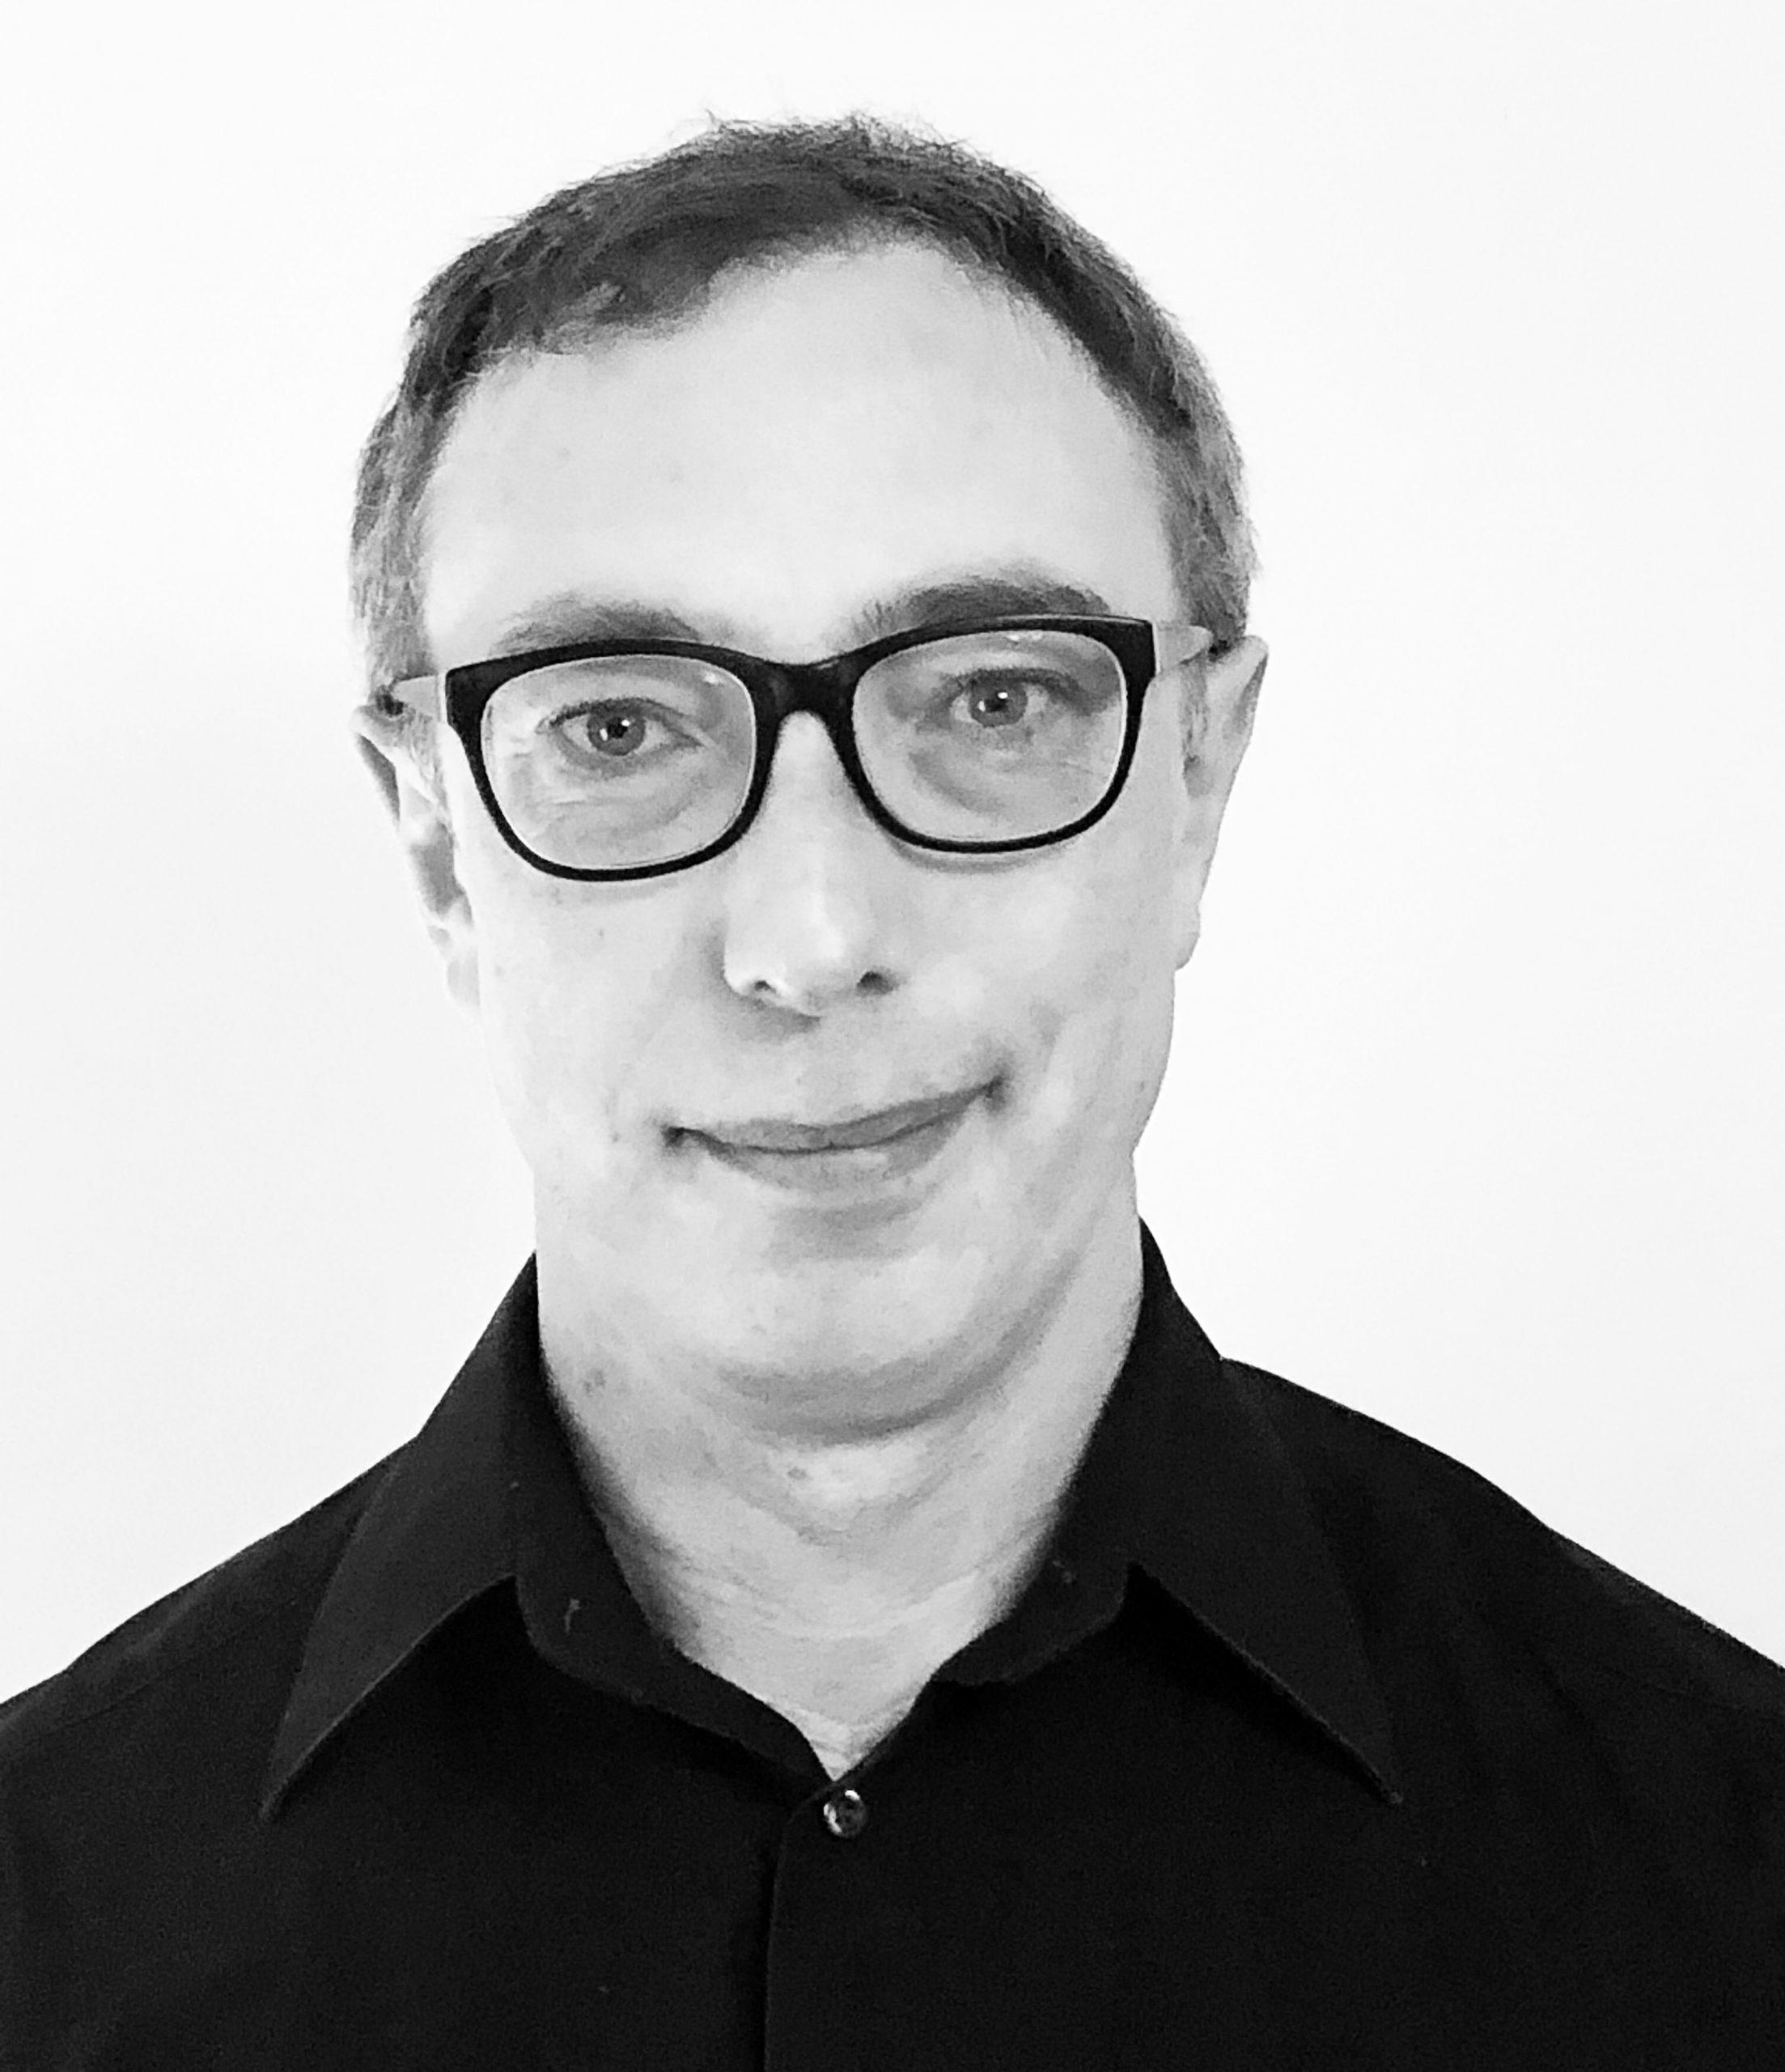 Joel DeStefano